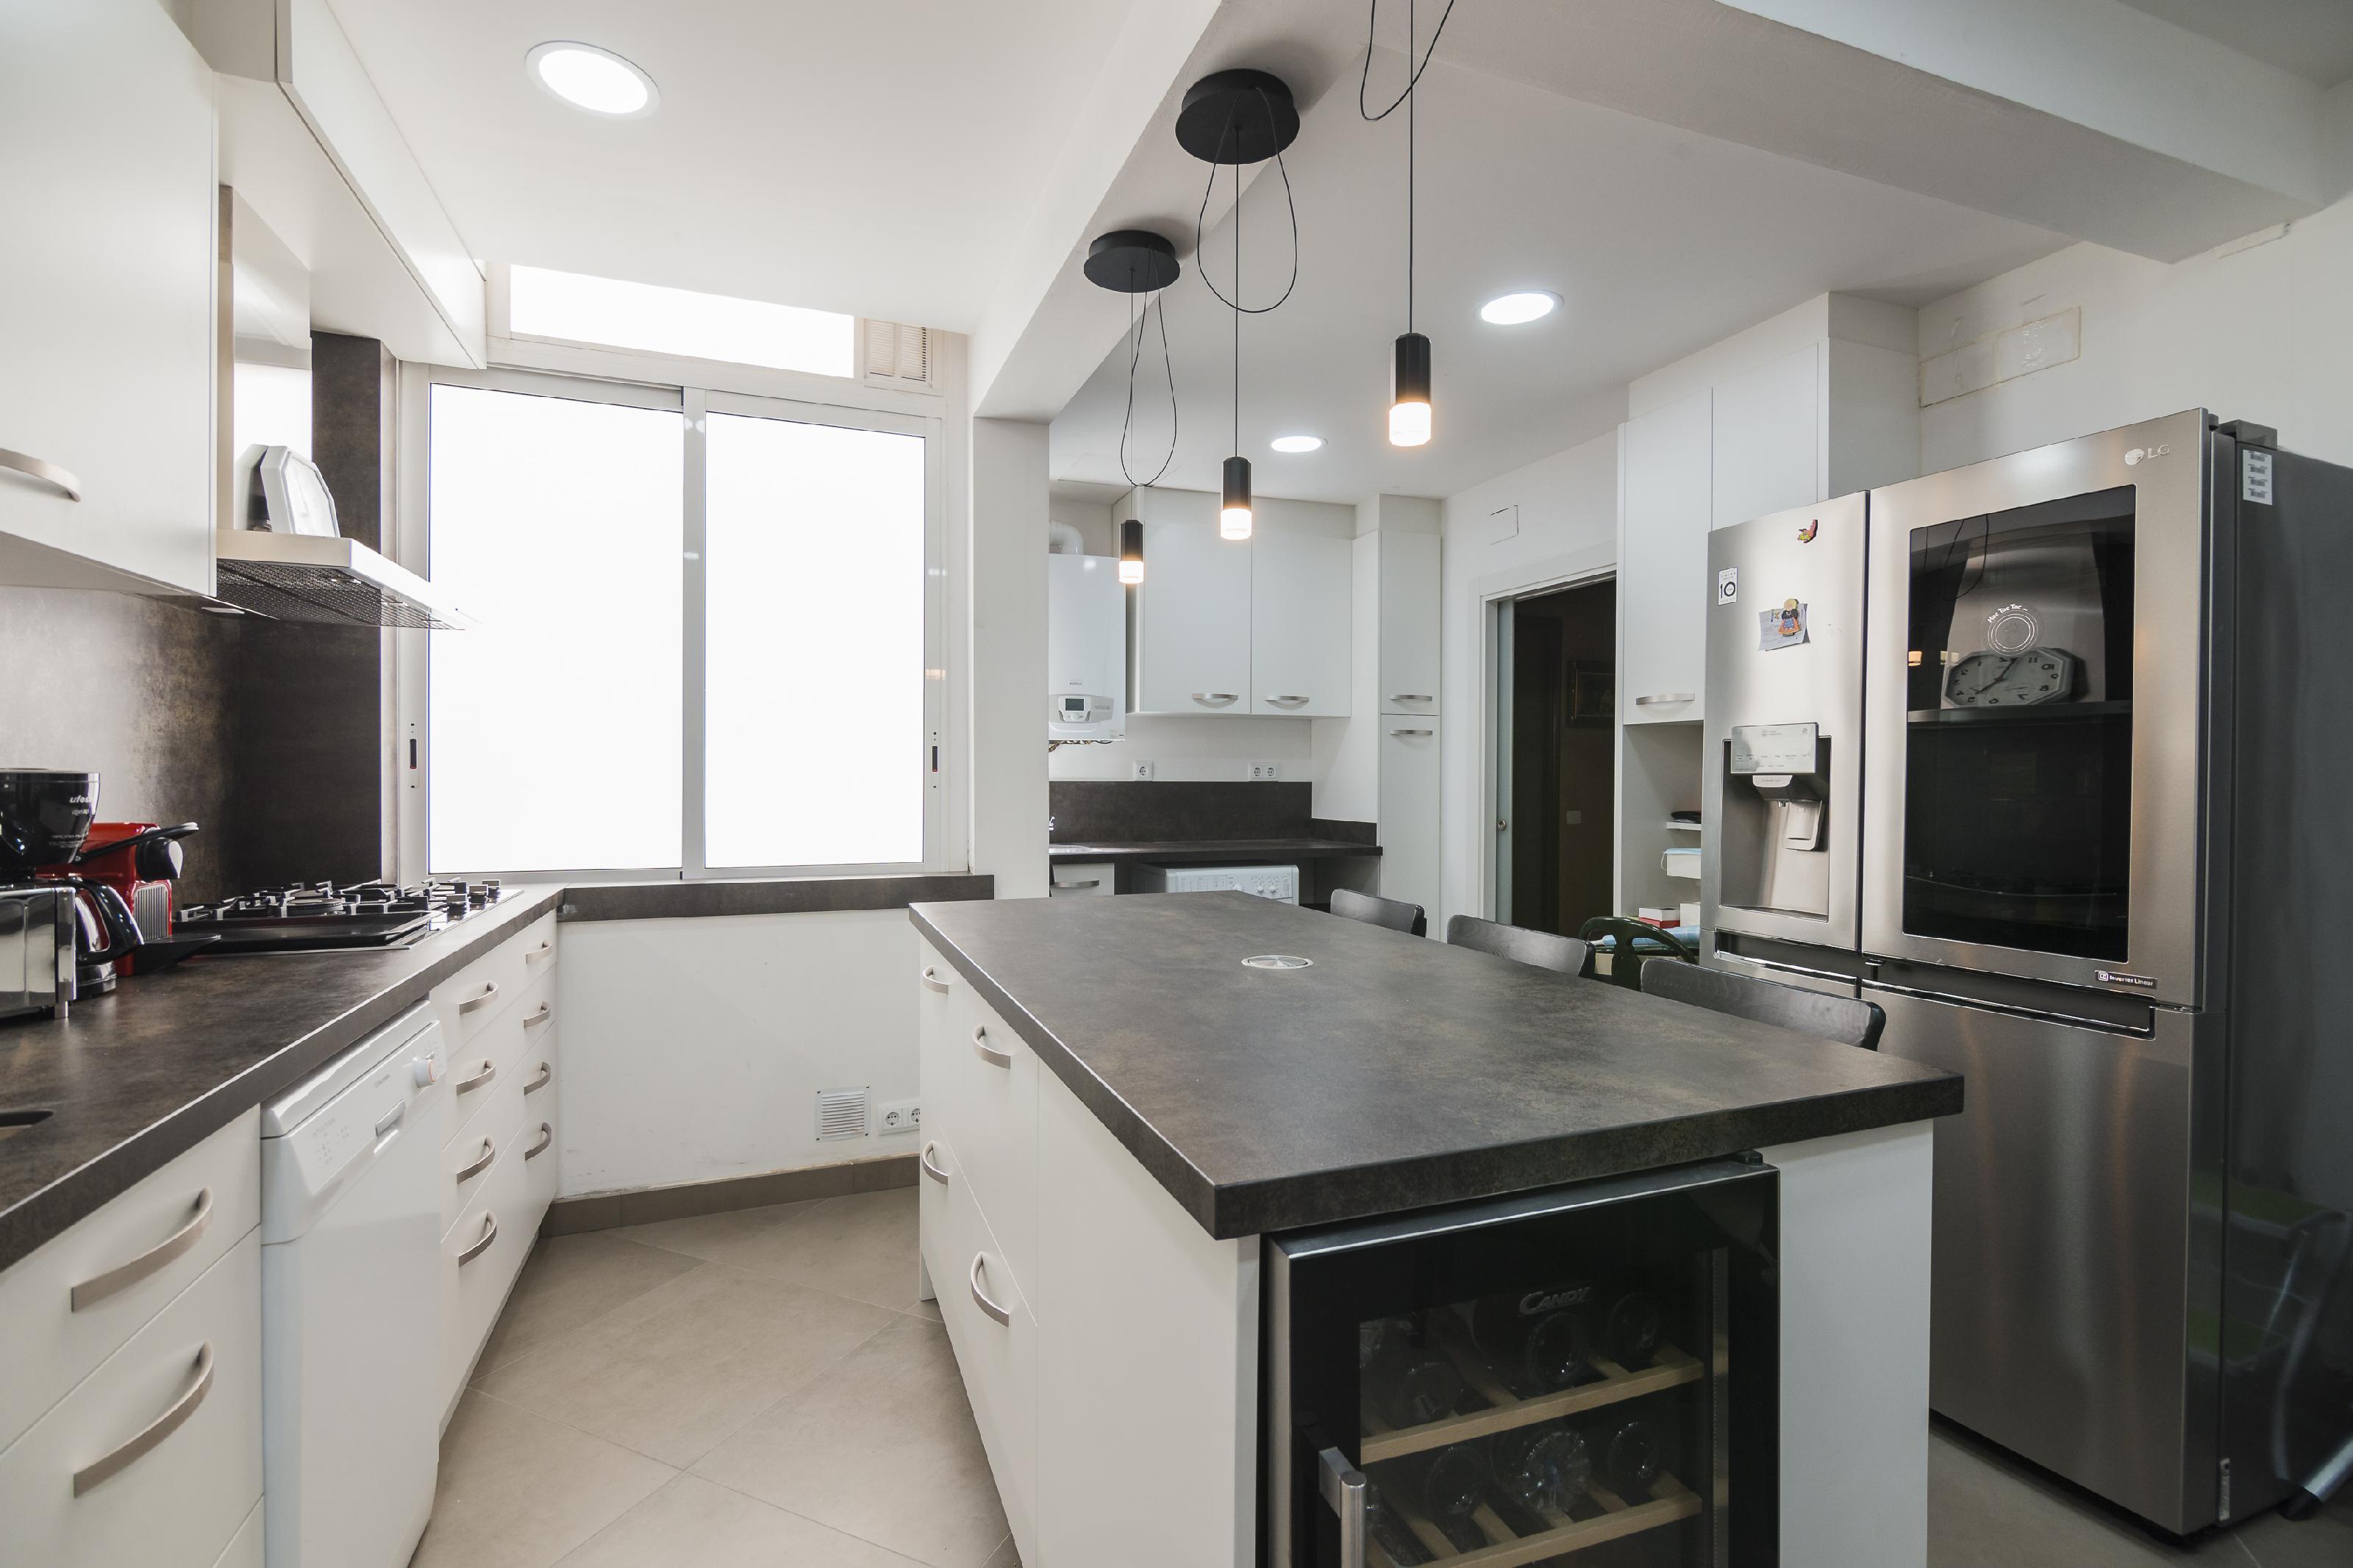 249856 Flat for sale in Sarrià-Sant Gervasi, Sant Gervasi-Galvany 3